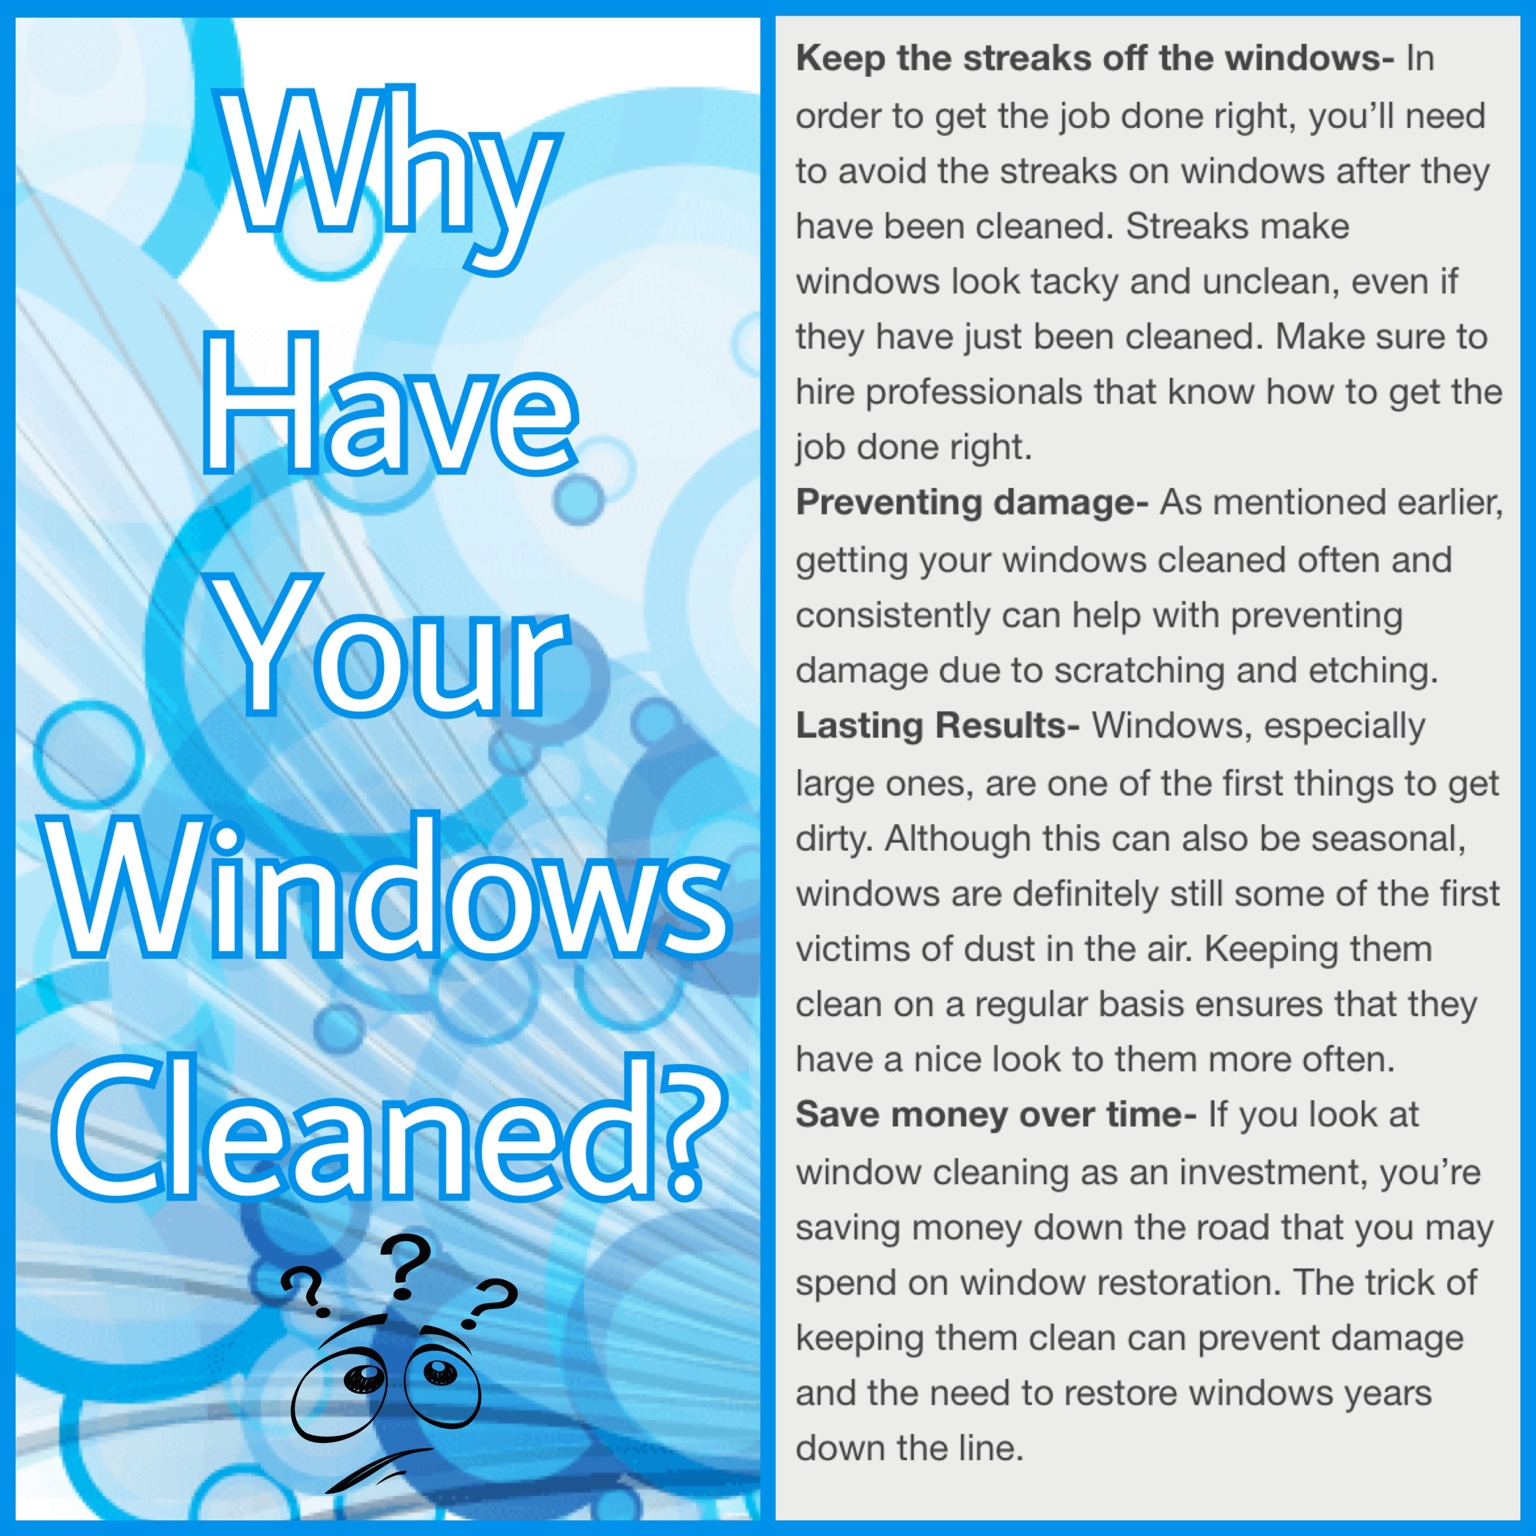 ba90ad385ffb02f26d9535af3bb31386jpeg sent using the window cleaning